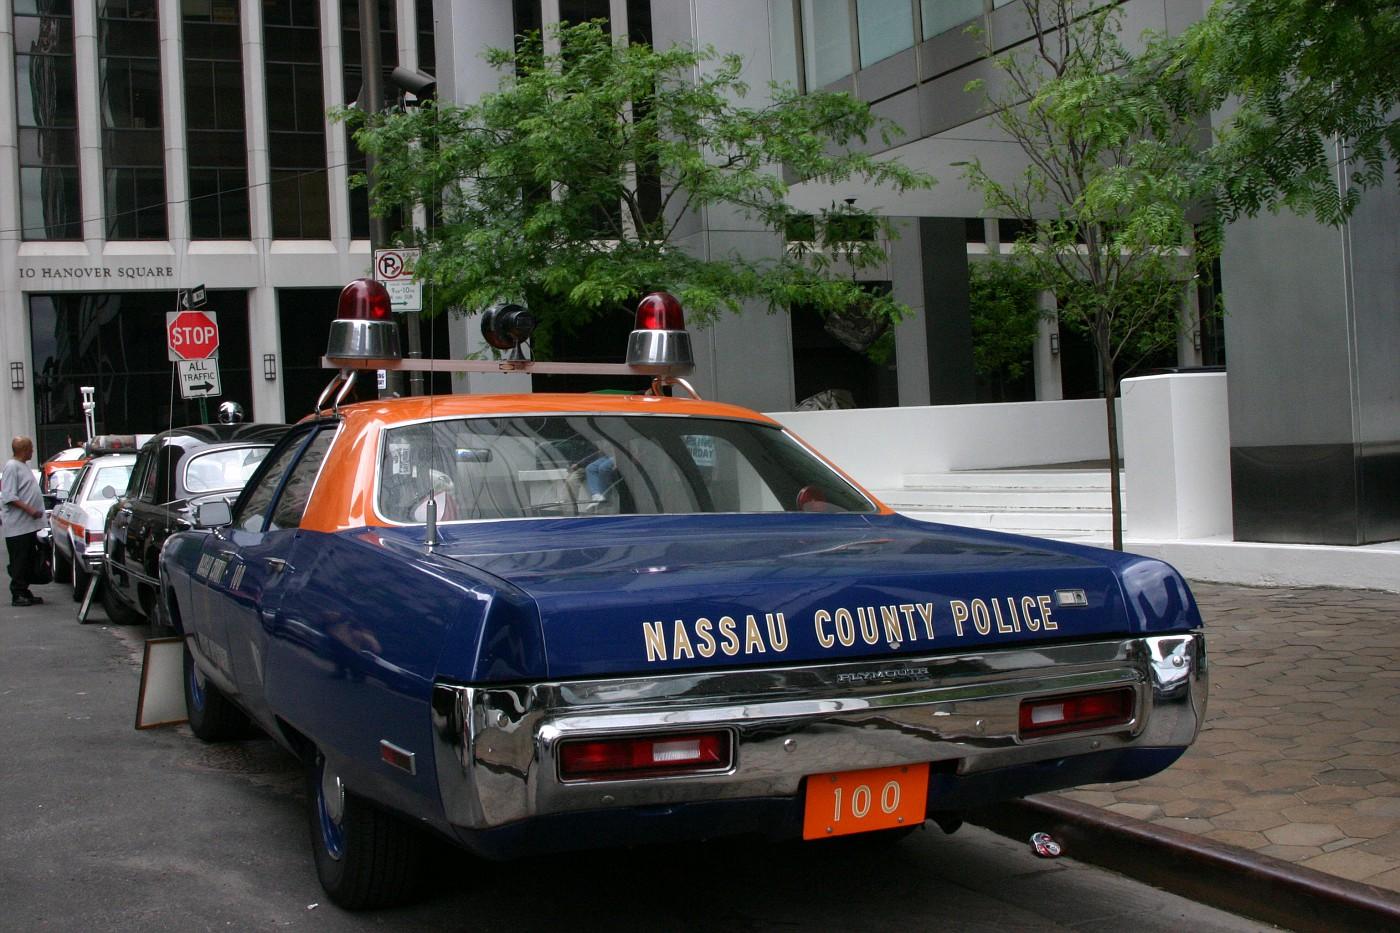 photo ny nassau county police new york album copcar dot com photo and video. Black Bedroom Furniture Sets. Home Design Ideas